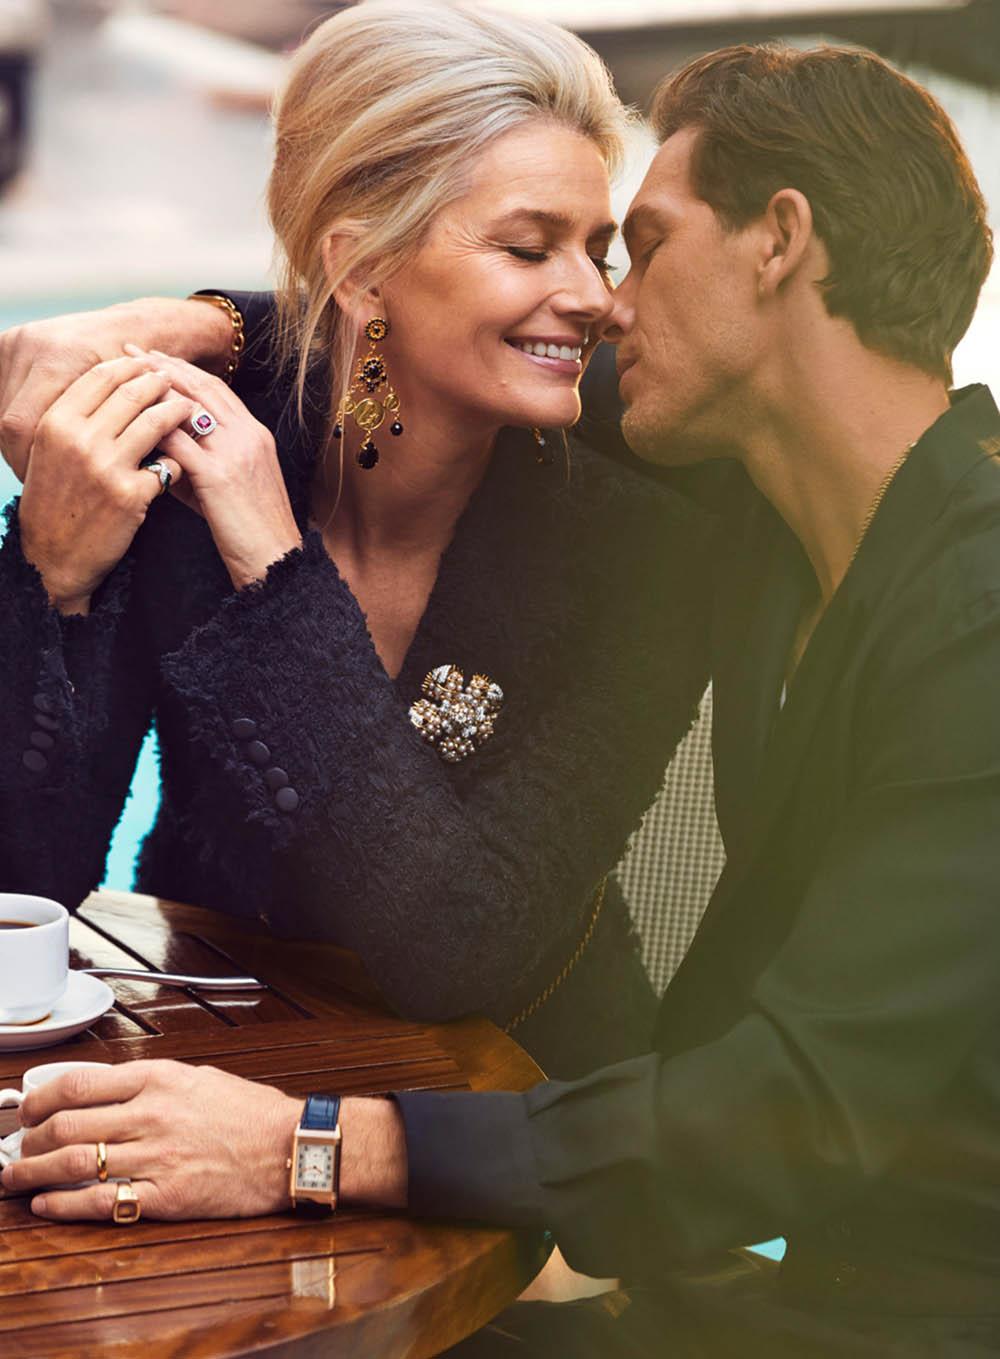 Paulina Porizkova and Adam Senn by Alexi Lubomirski for Harper's Bazaar US May 2020